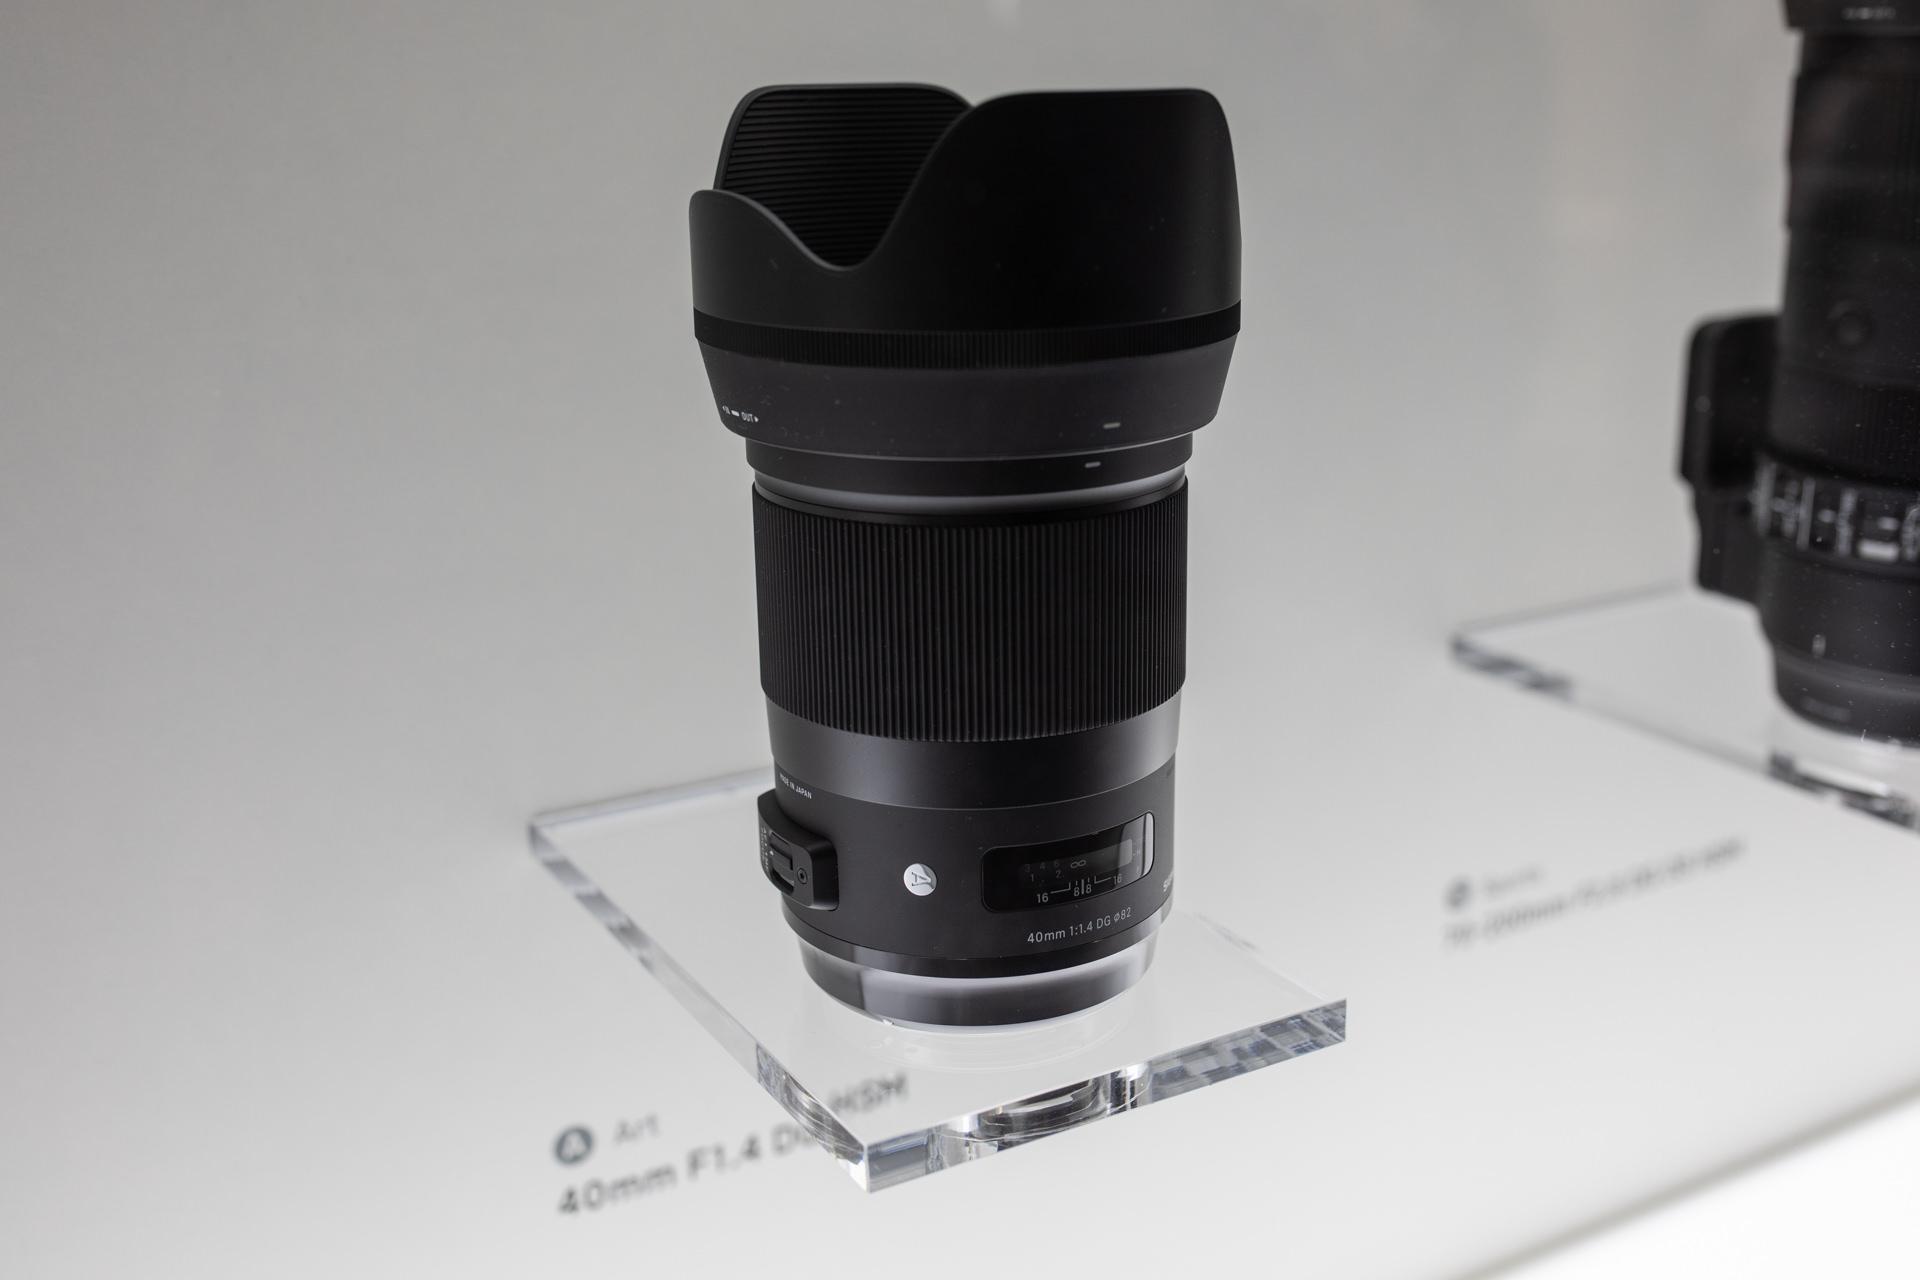 Sigma 40mm 1.4 Art